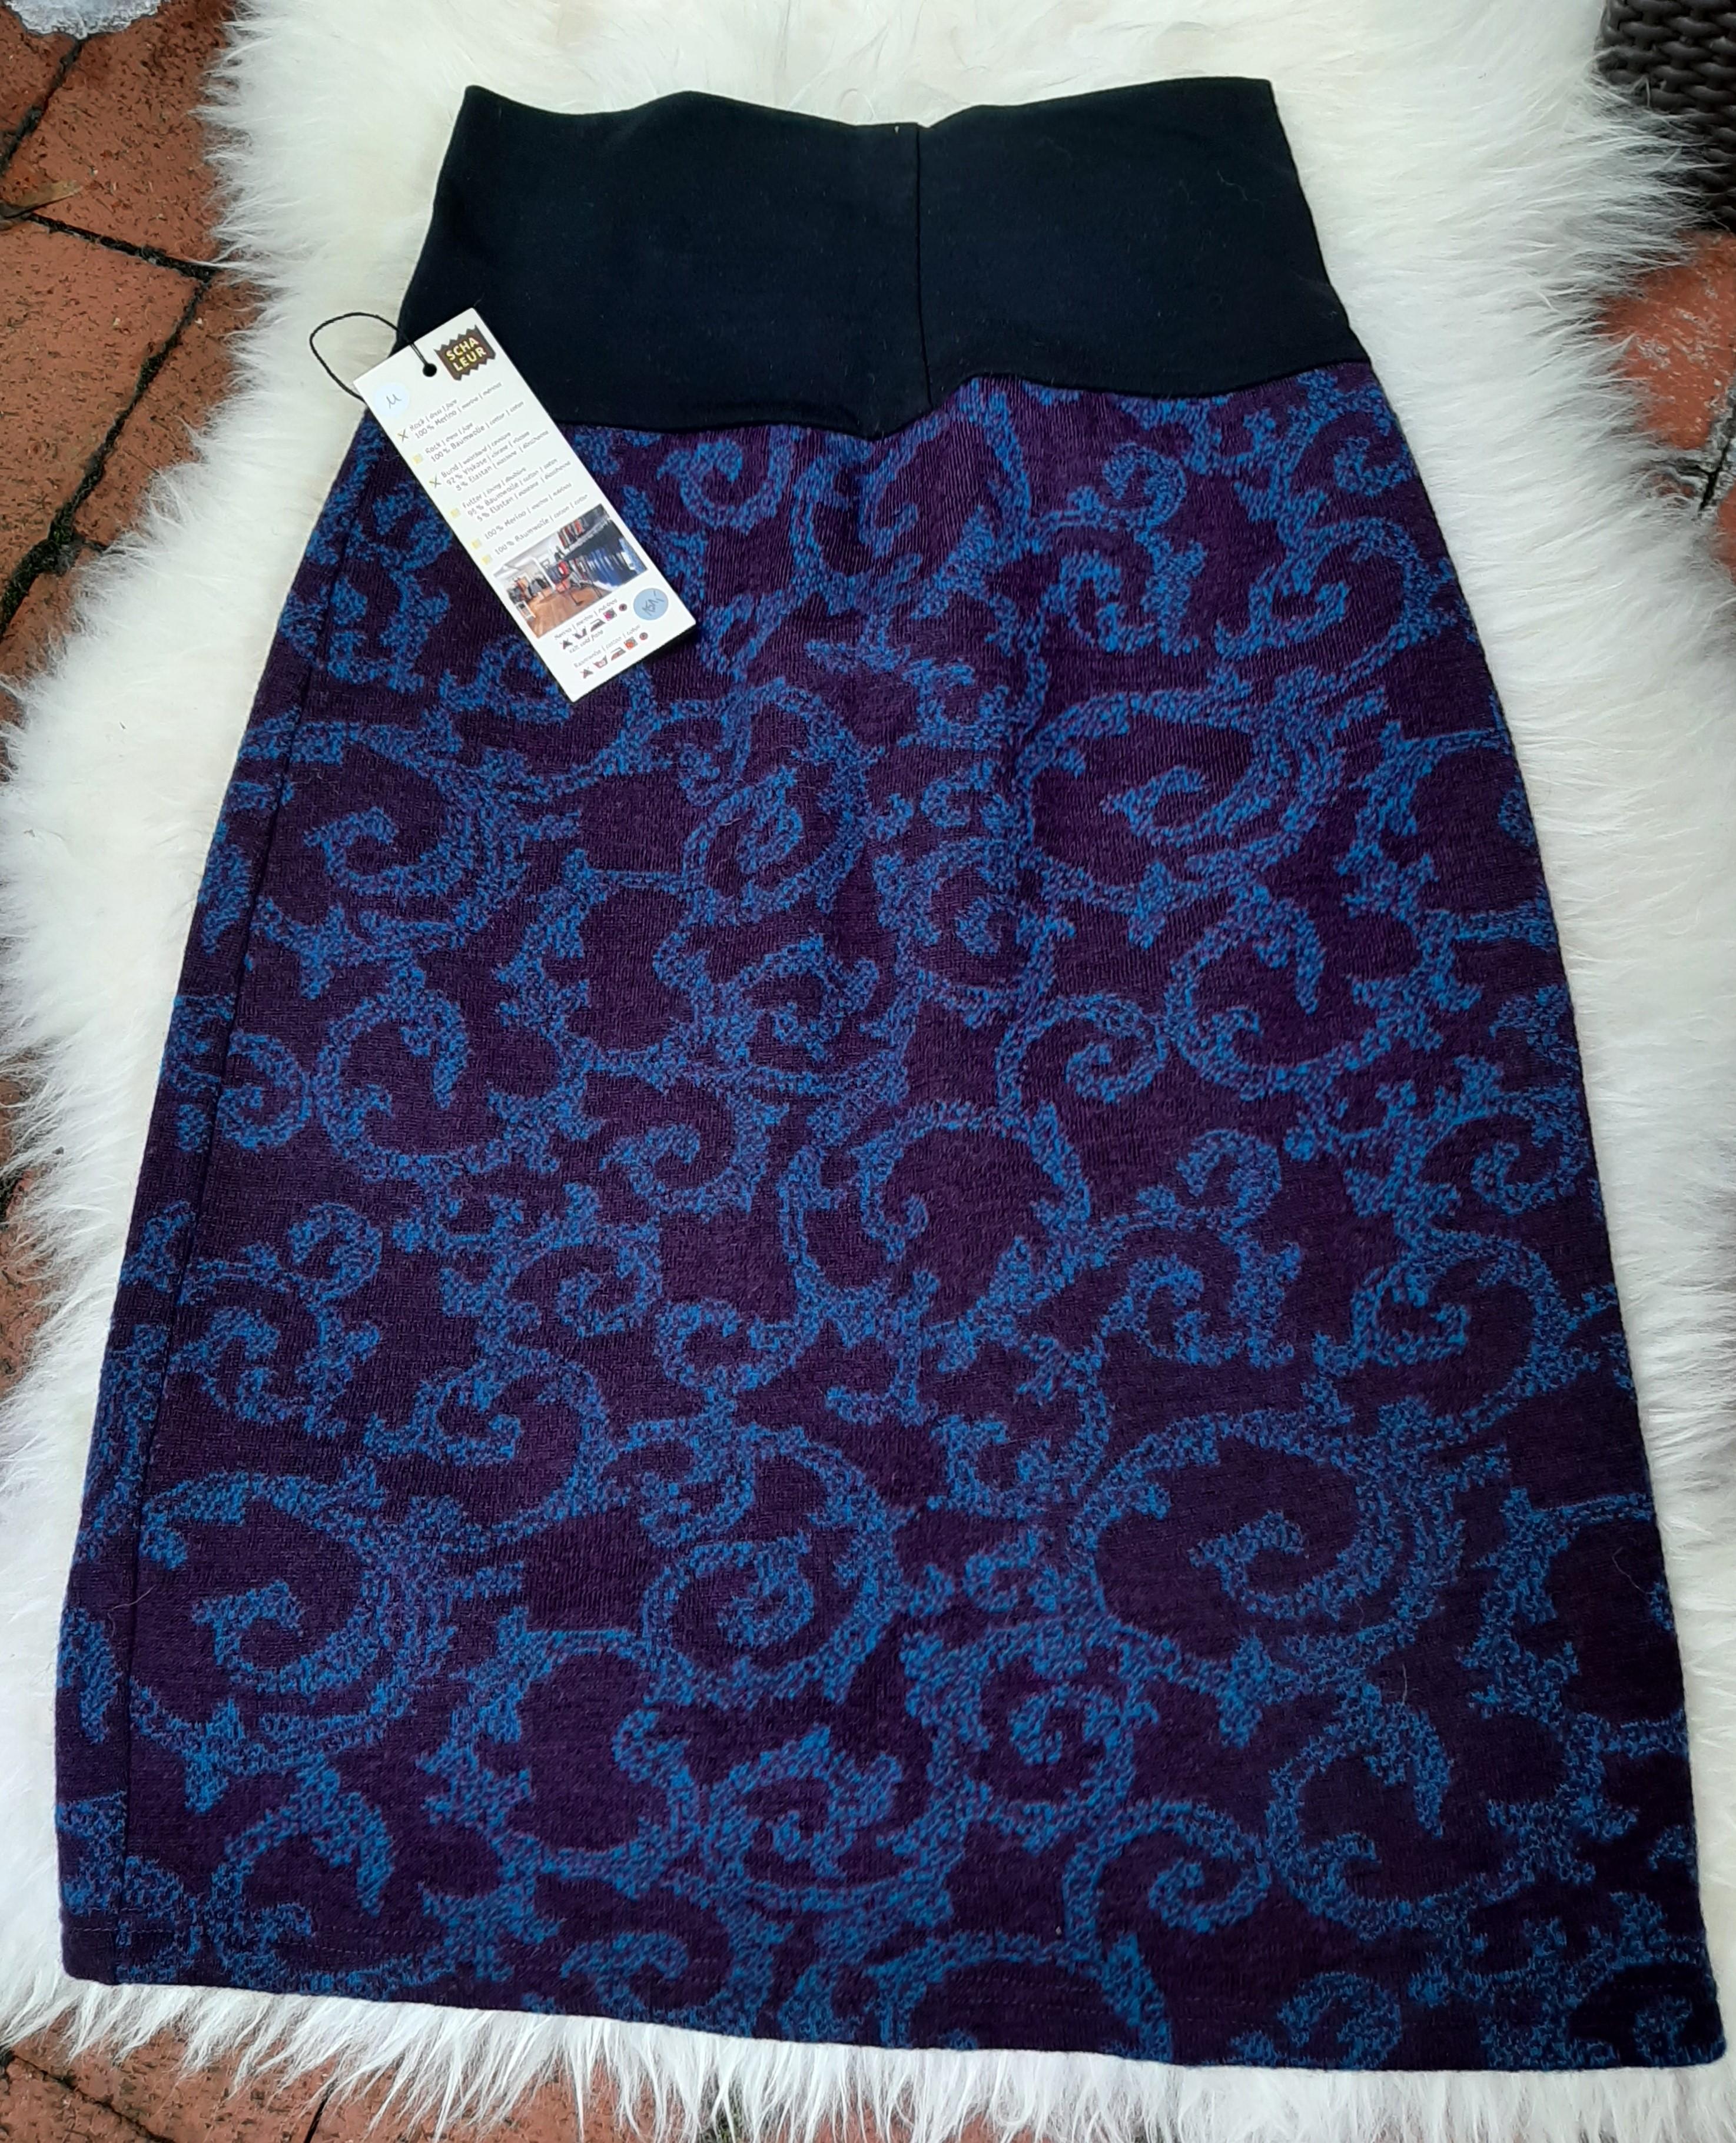 Schaleur Rock blau lila